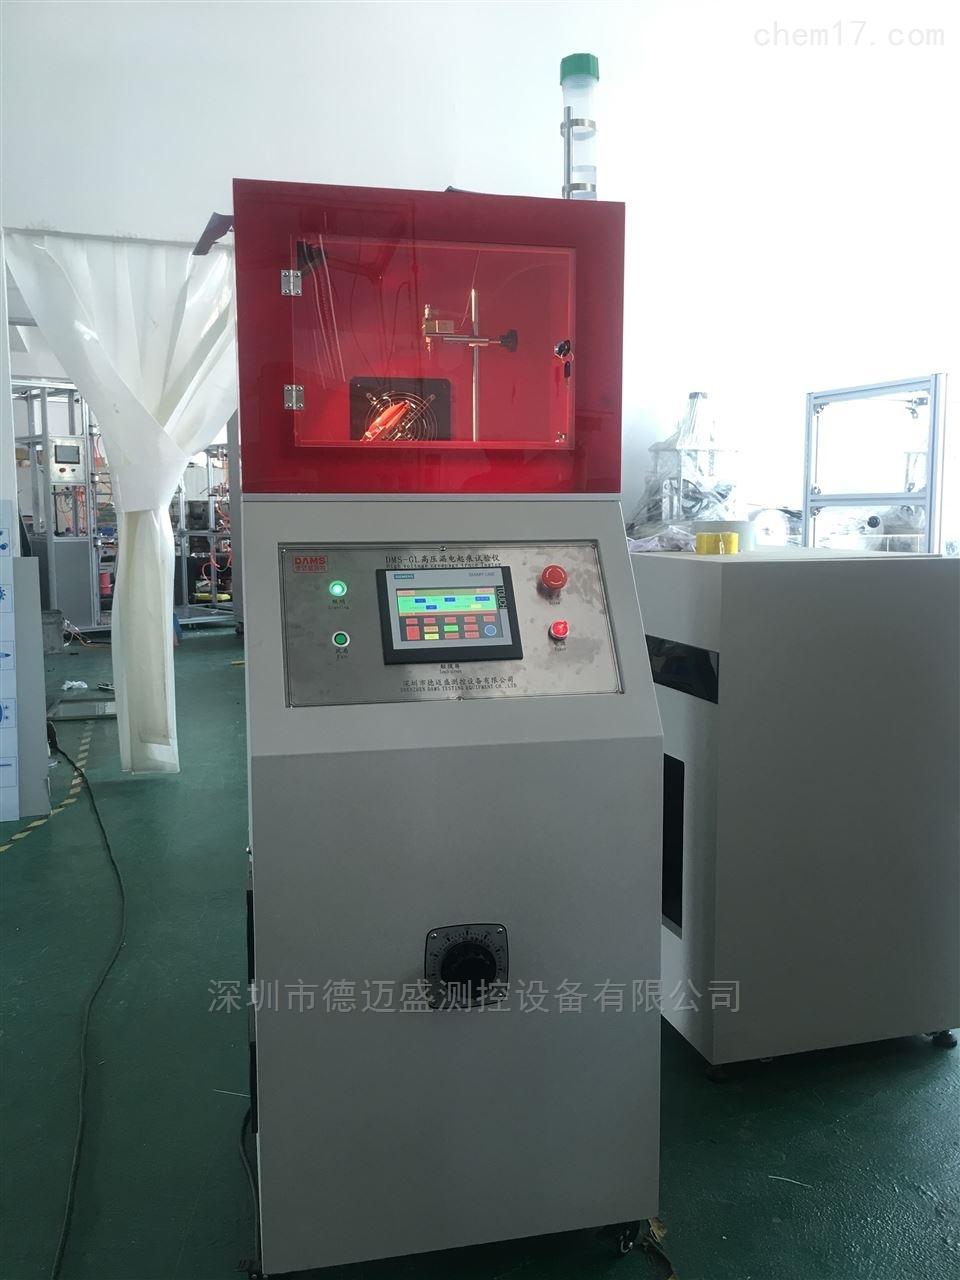 GB6553高电压起痕试验仪